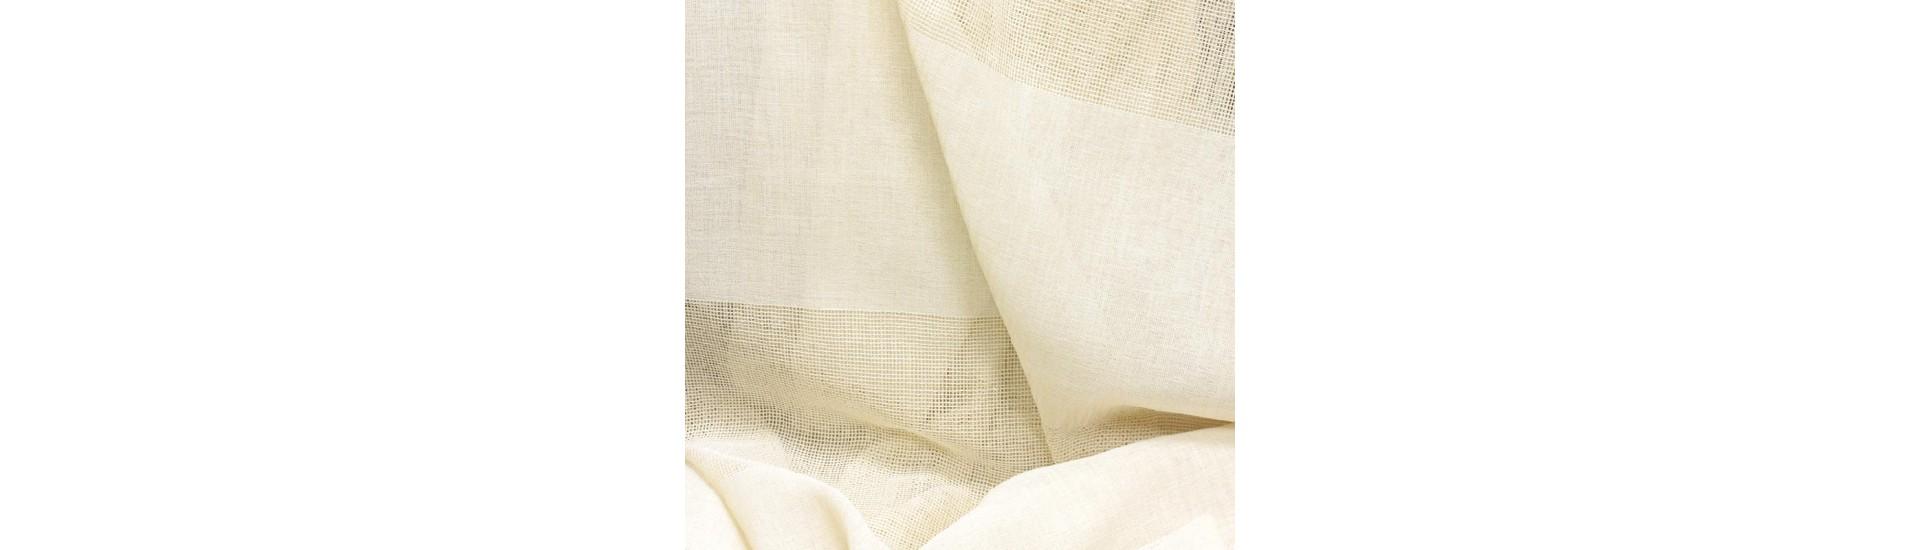 Ткань для штор имитация льна 5752/H008 SETKA TUL высота 312 см (~40 м)